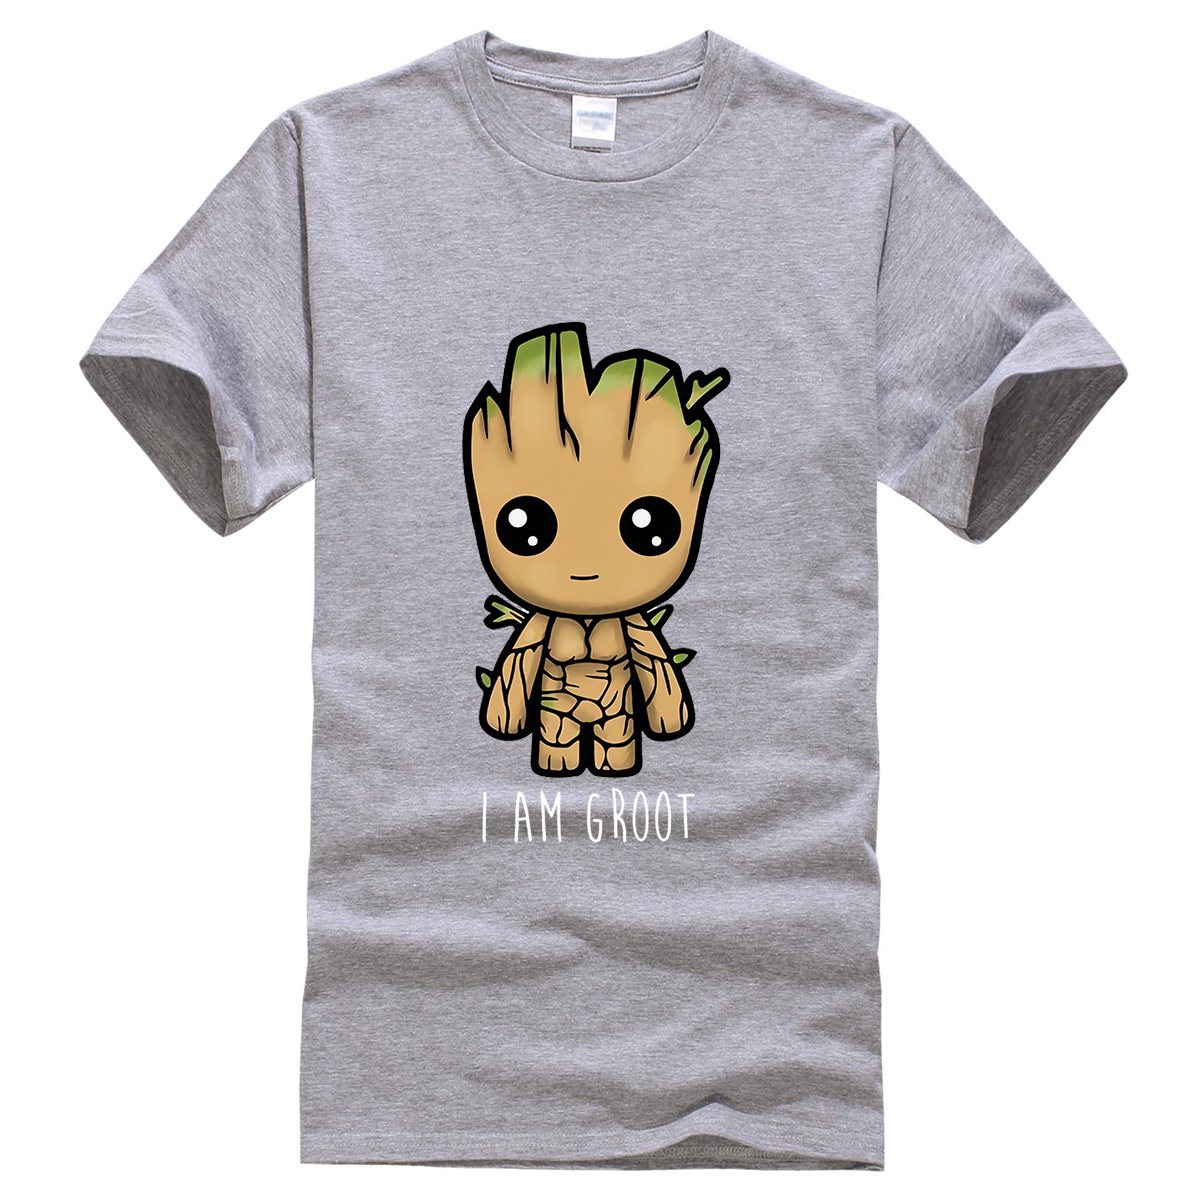 I Am Groot Casual T Shirt High Quality Men's T-shirts Streetwear Cotton Male T-Shirt Cute Print Groot Summer Man Brand Tops Tees